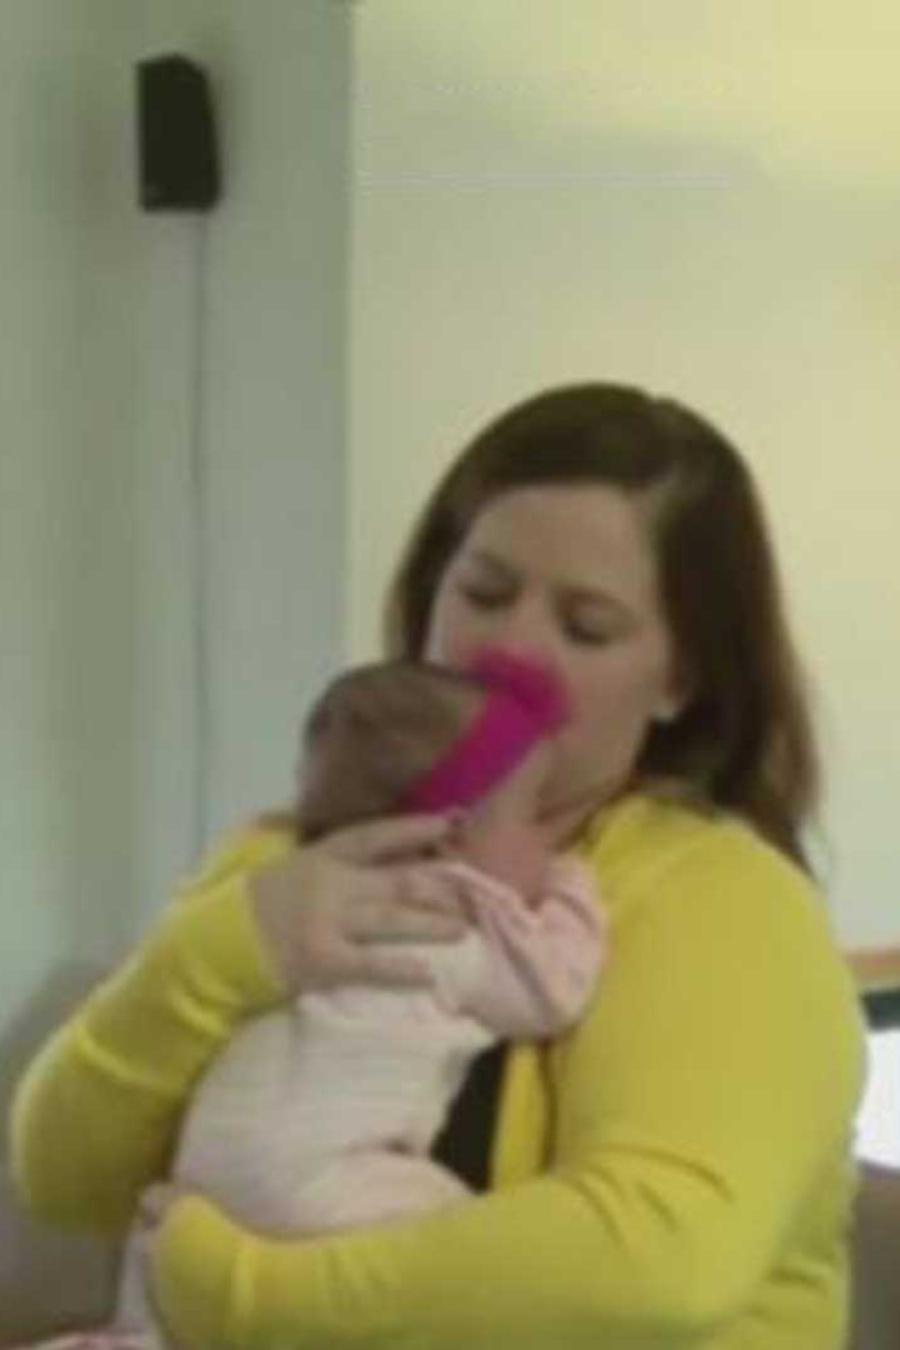 mujer da a luz a trillizas que fueron concebidas de forma natural